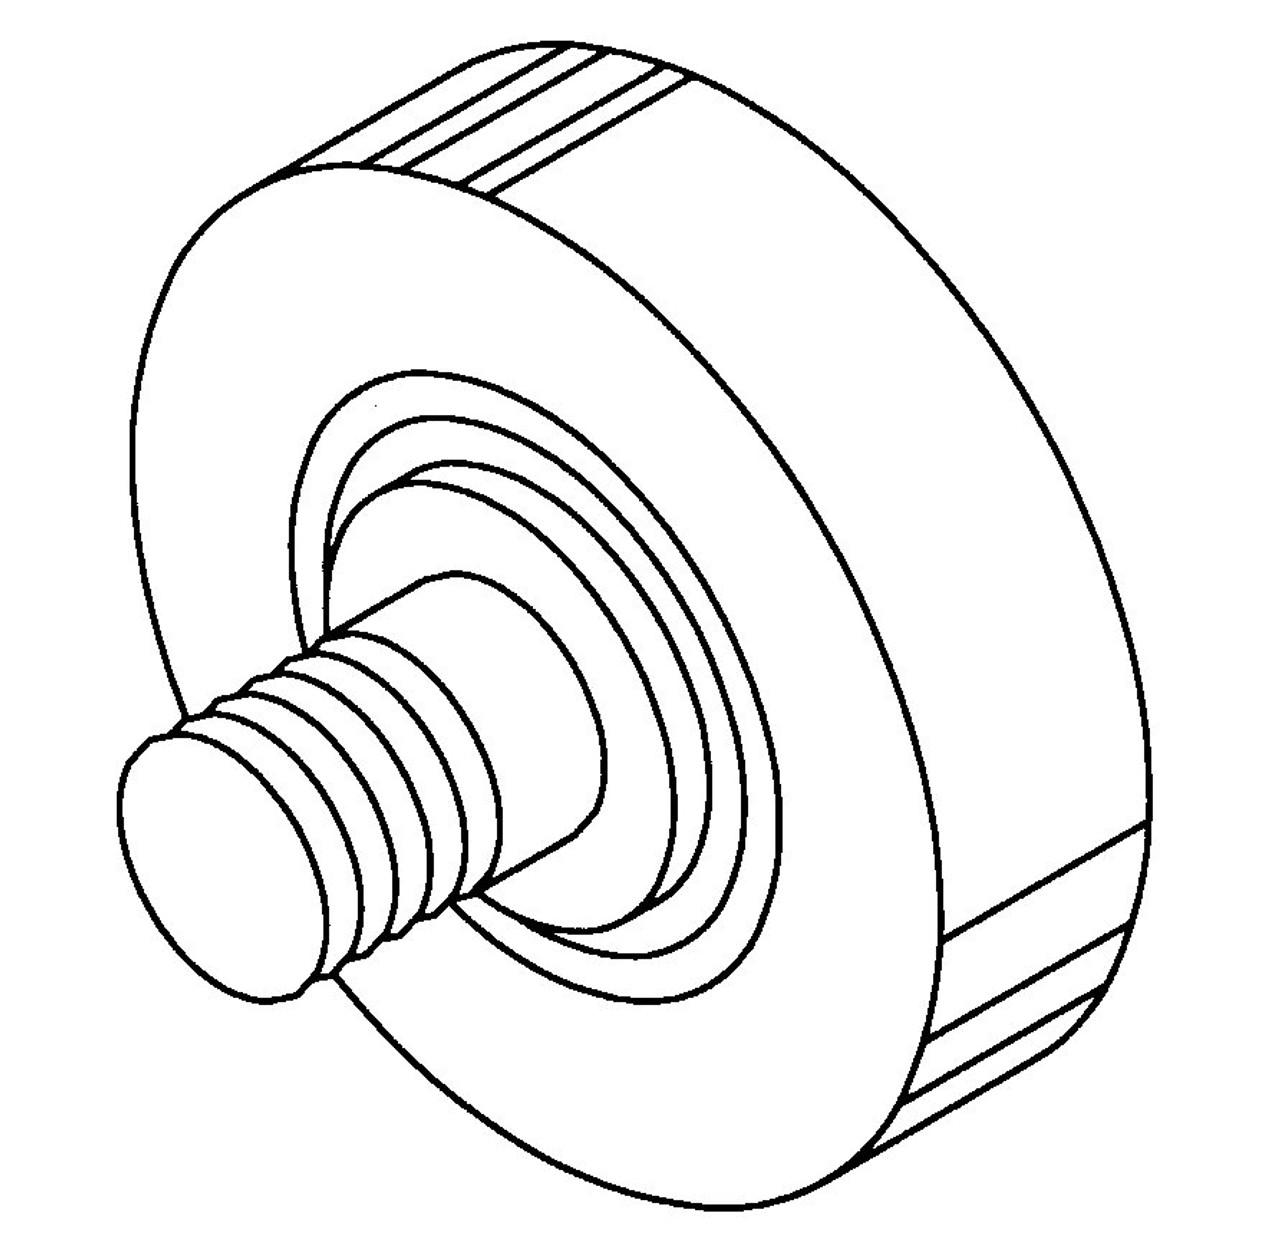 Table Bearing - B010-159 & B020-159